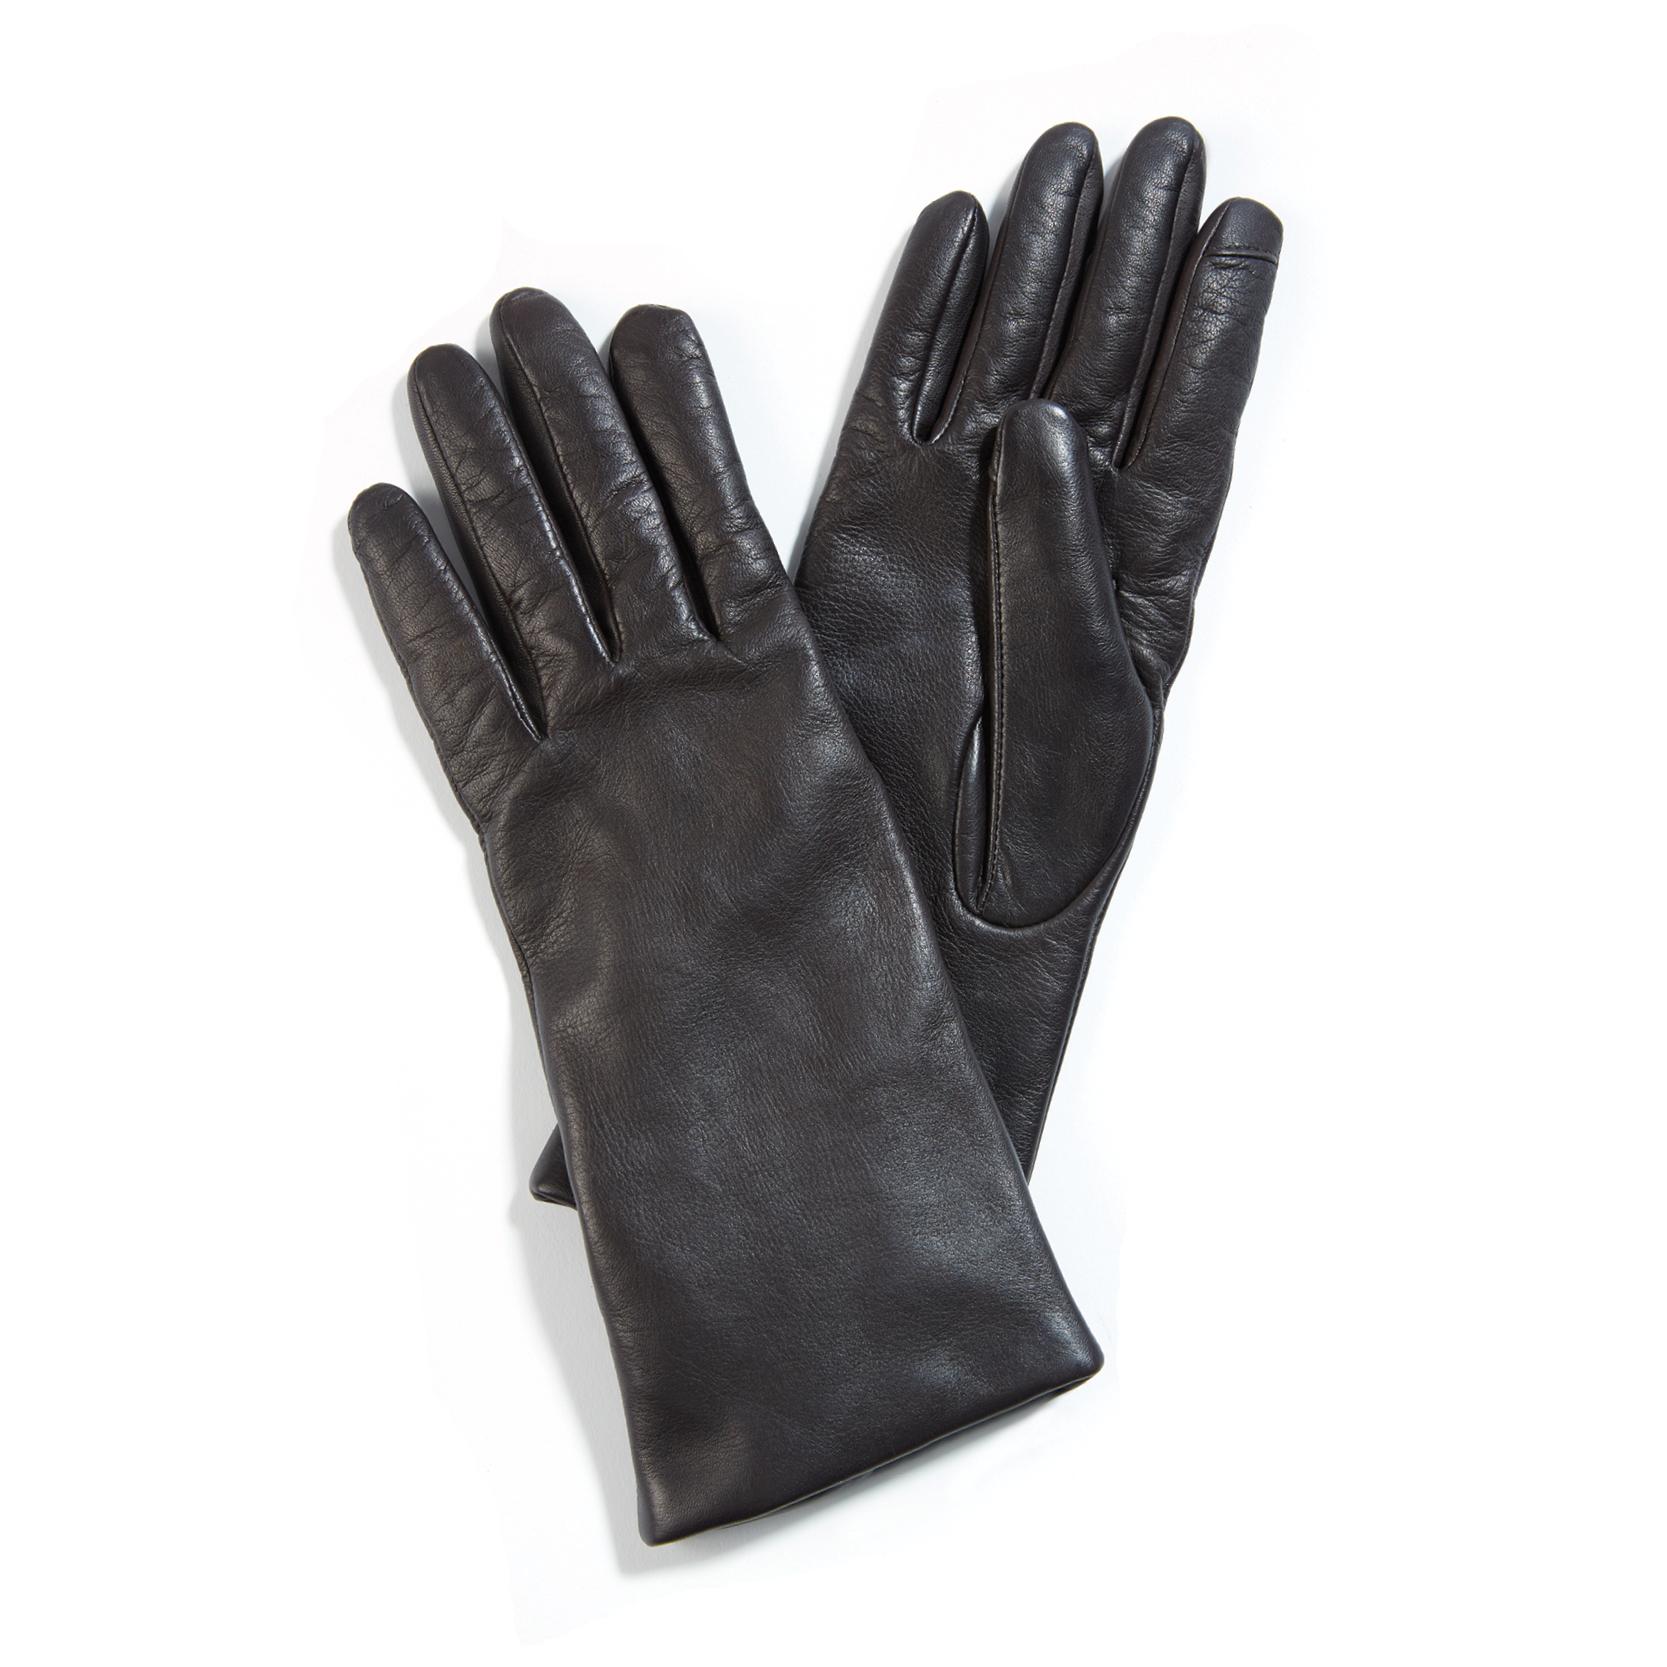 Tanger Outlets Saks OFF 5th dark brown leather gloves